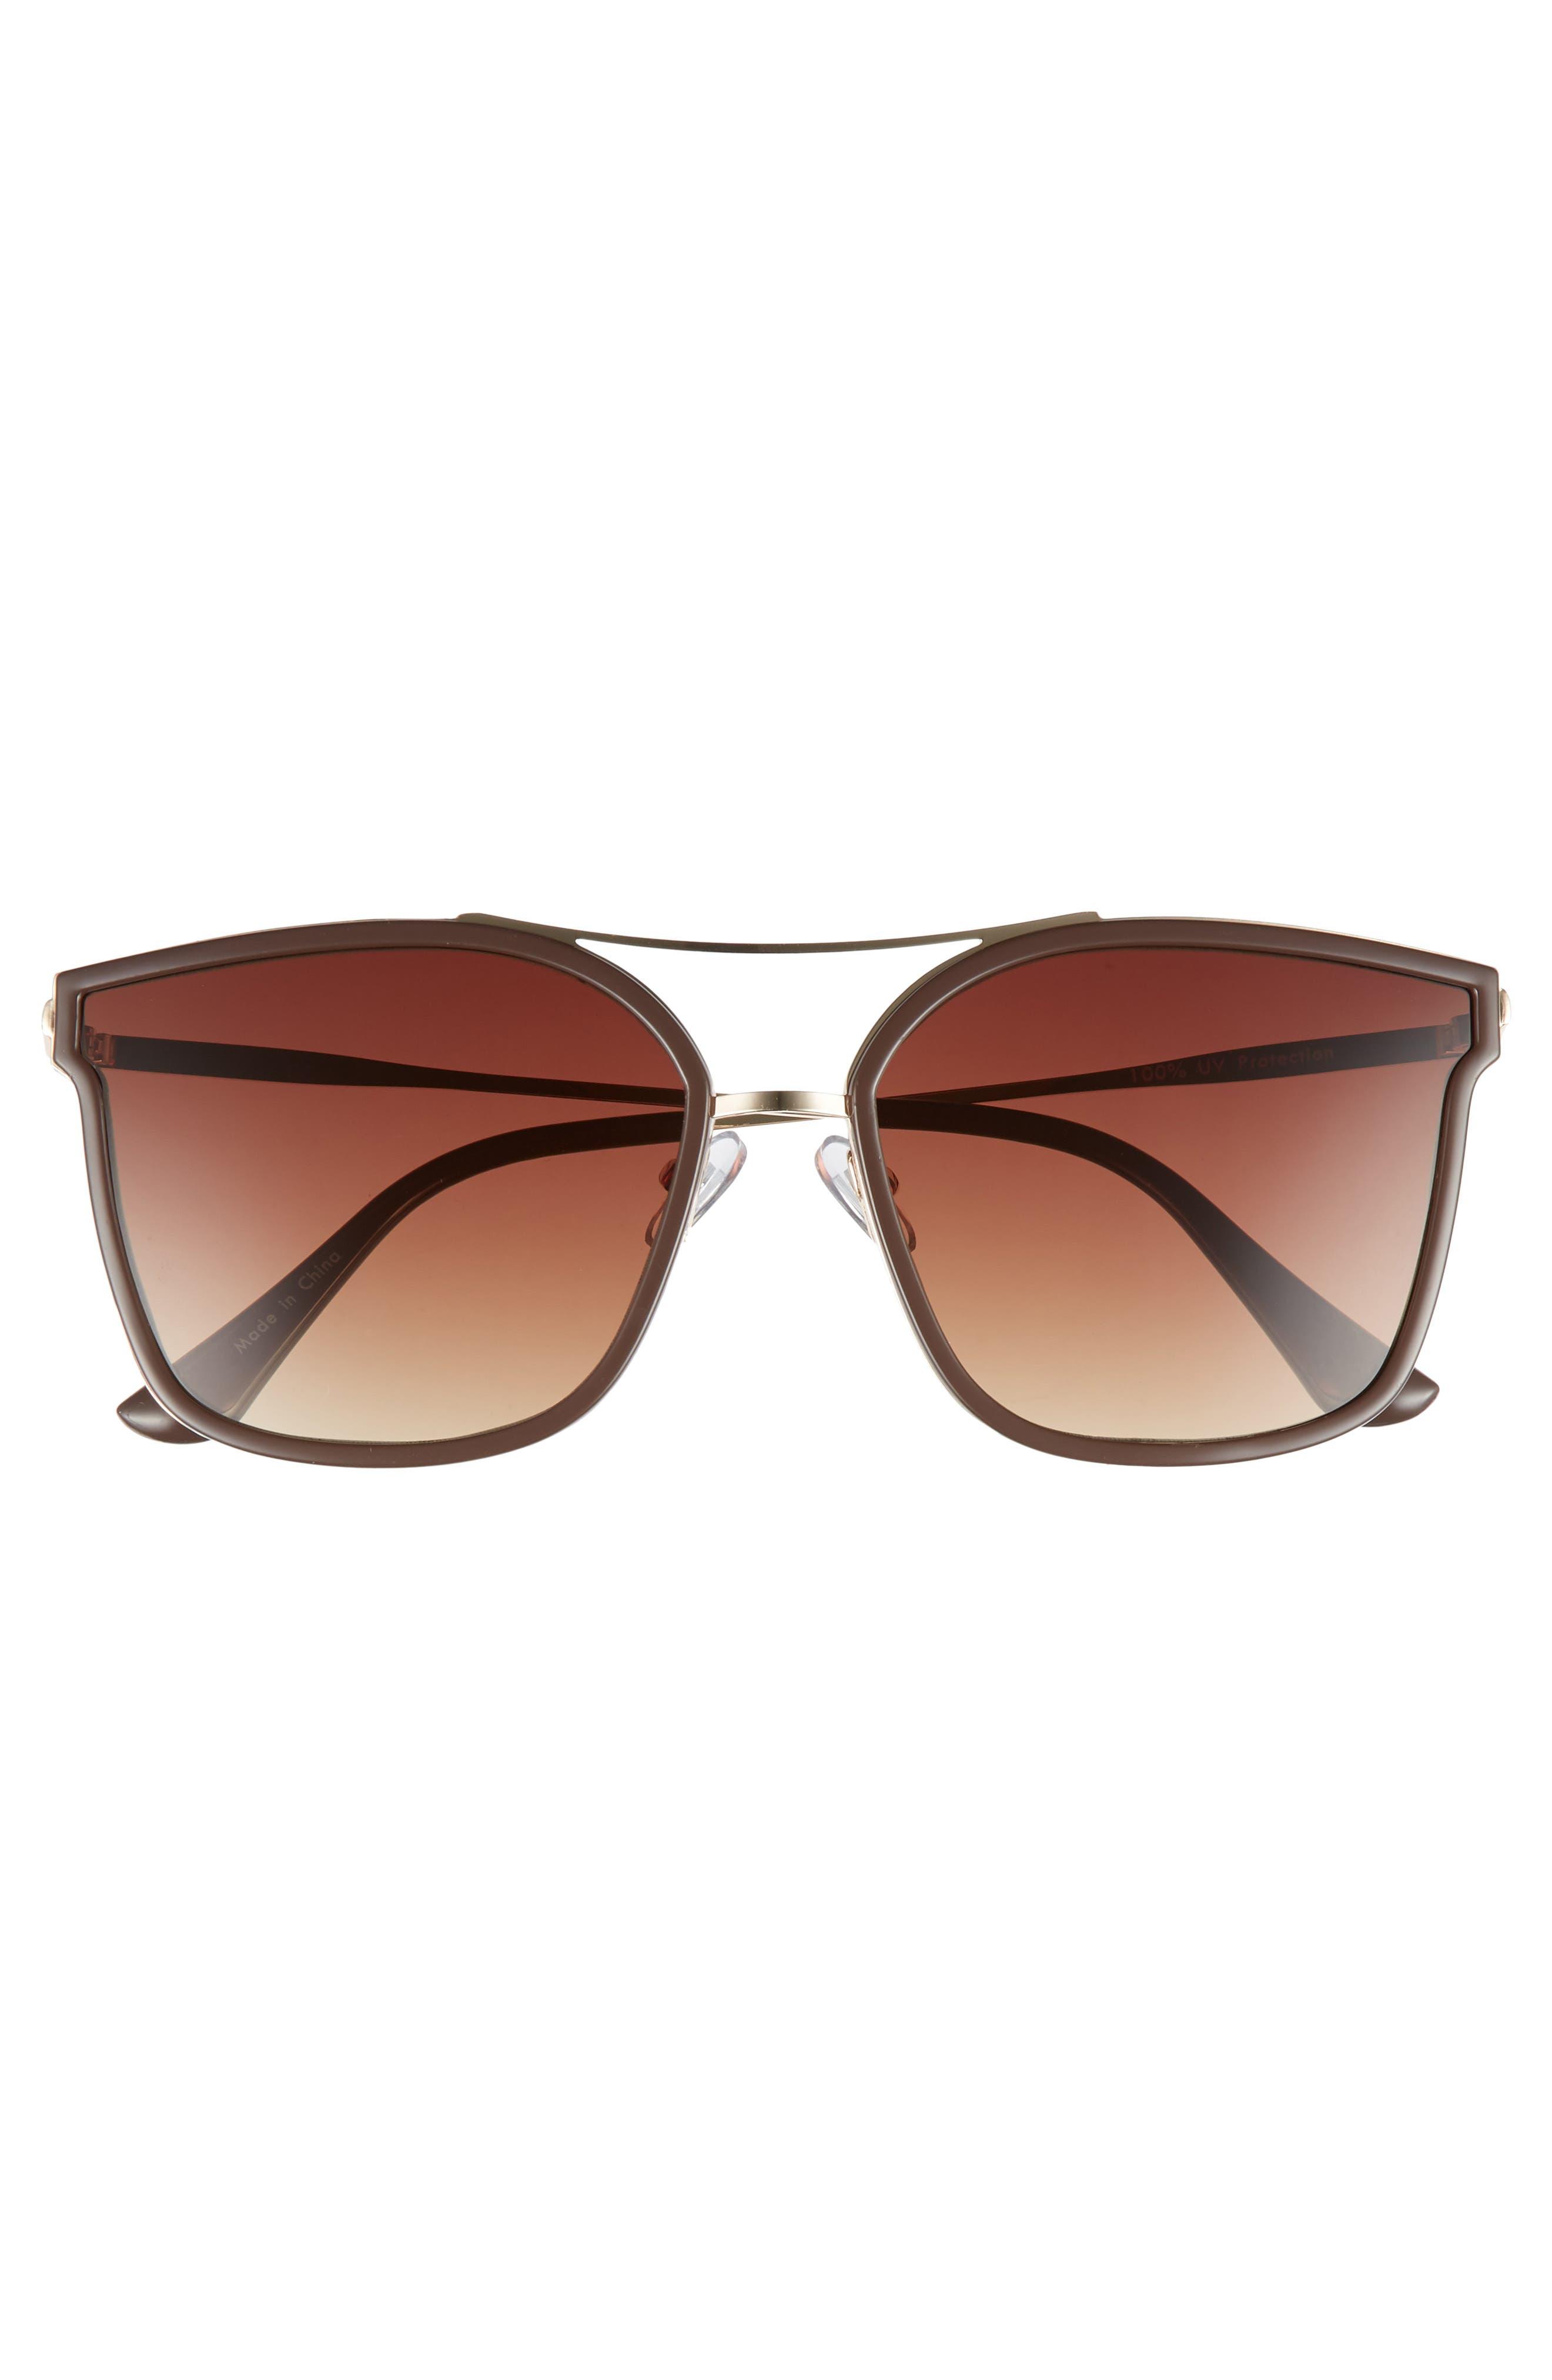 60mm Cat Eye Sunglasses,                             Alternate thumbnail 3, color,                             Gold/ Brown